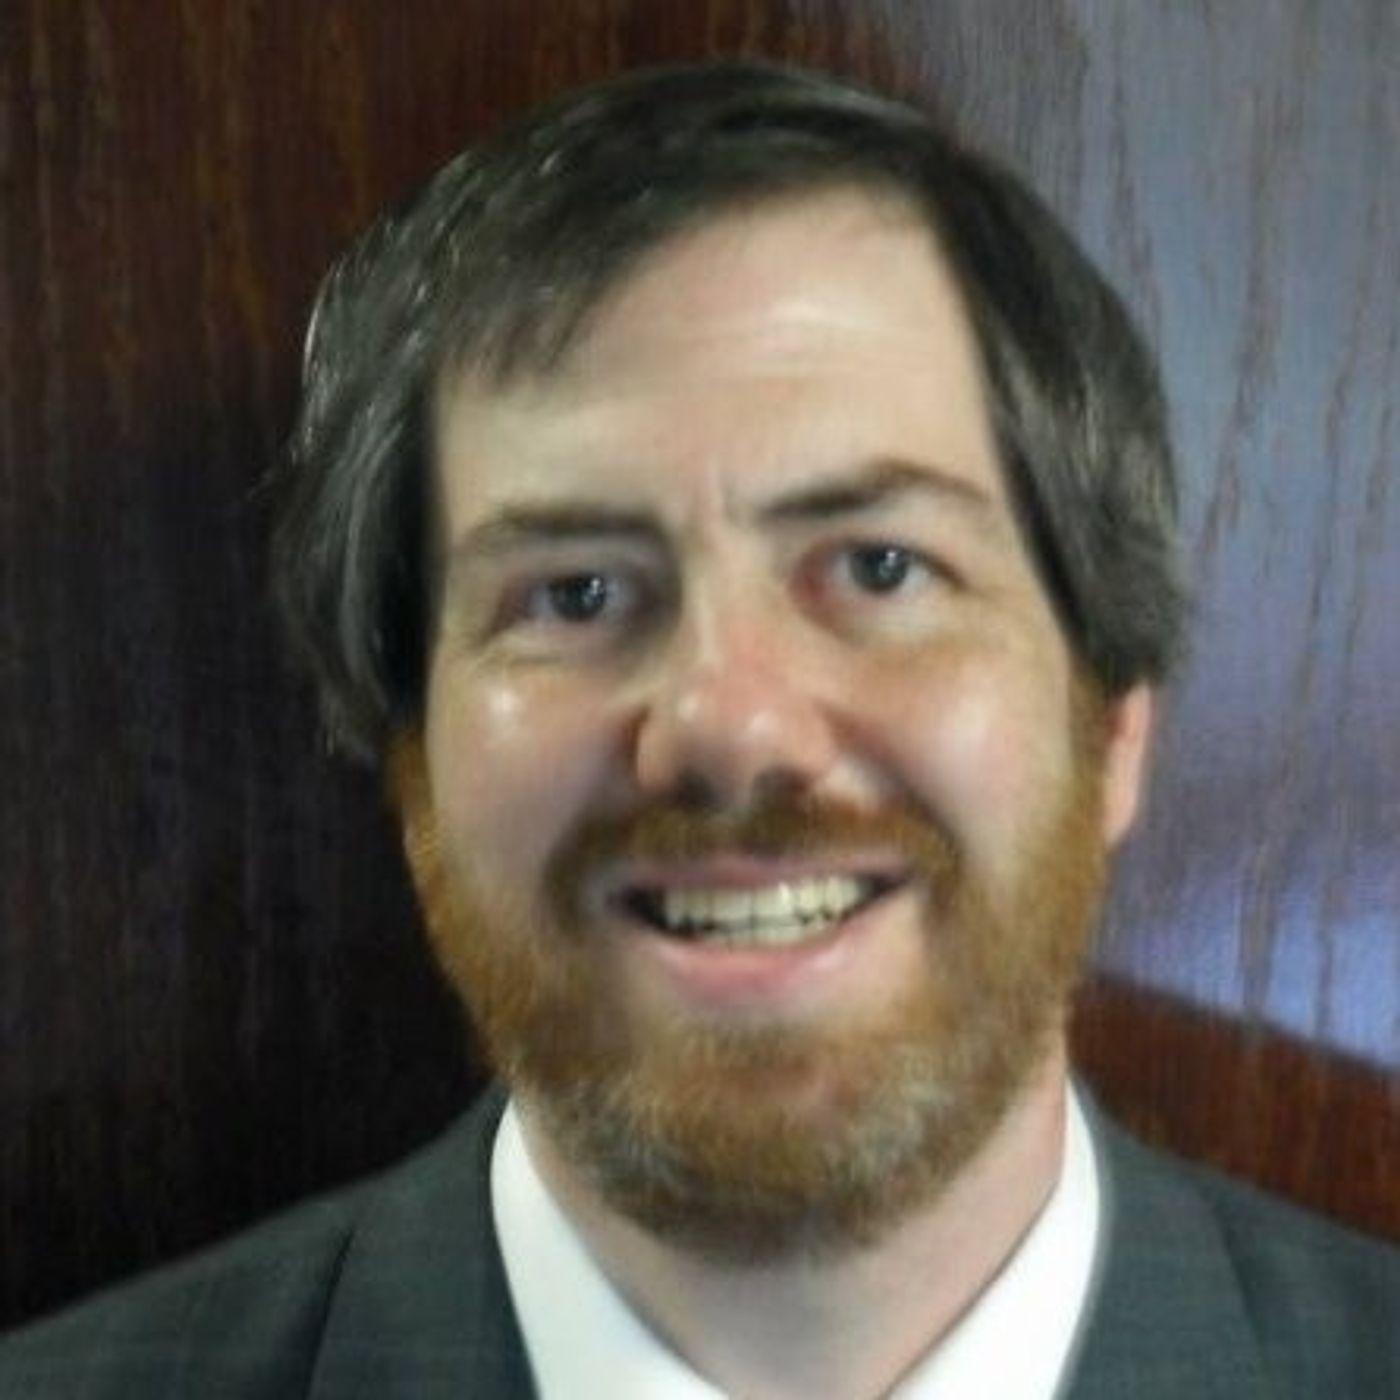 Employment Law Advice During Covid-19--Stuart Silverman